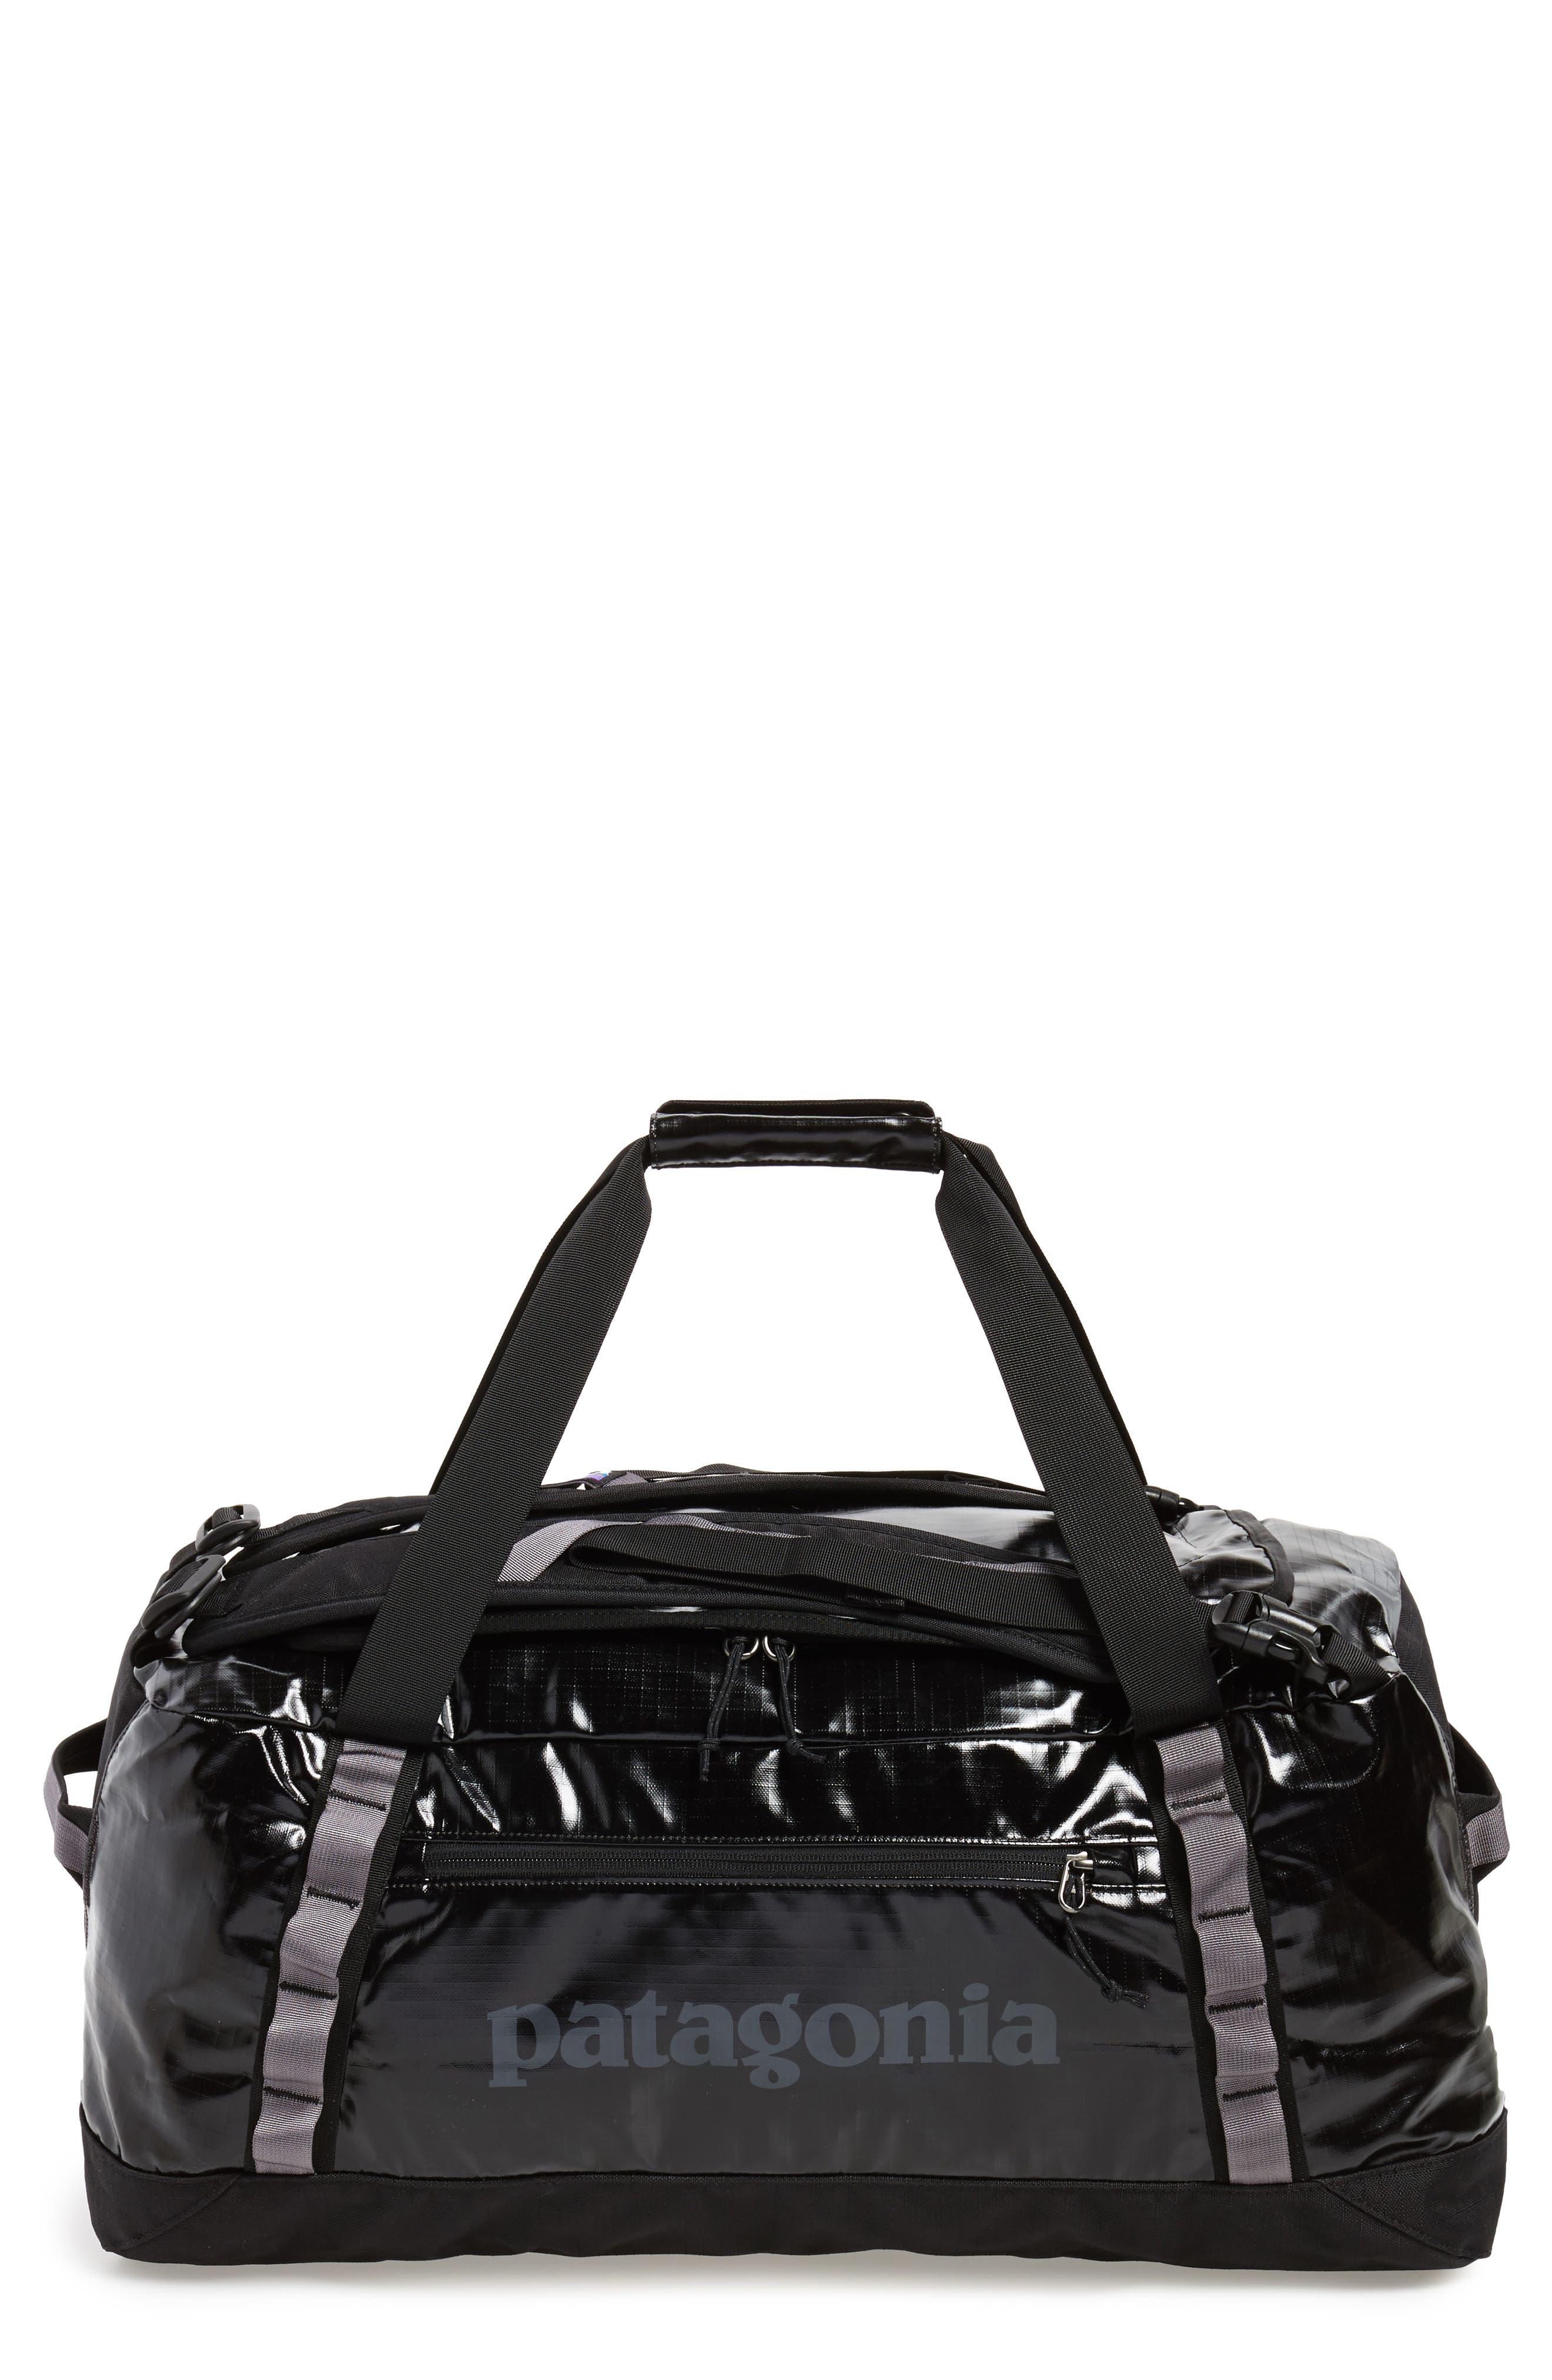 Black Hole Water Repellent Duffel Bag,                         Main,                         color, 001